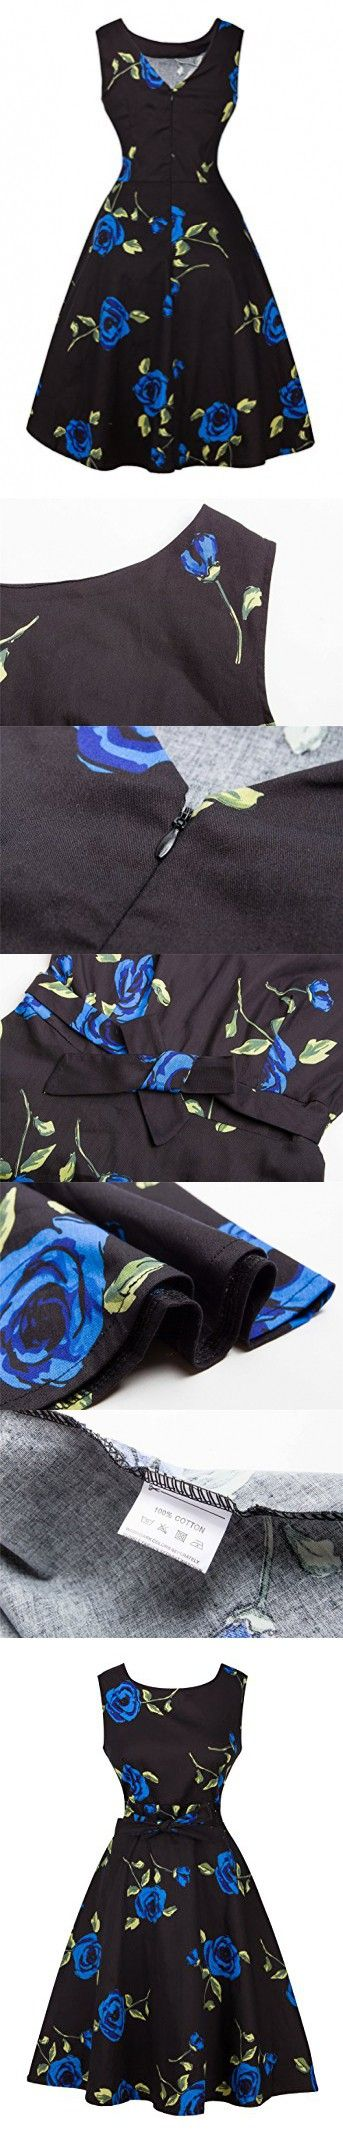 Angerella Womens Floral Retro Dresses Elegant Black Cocktail Dresses For Junior